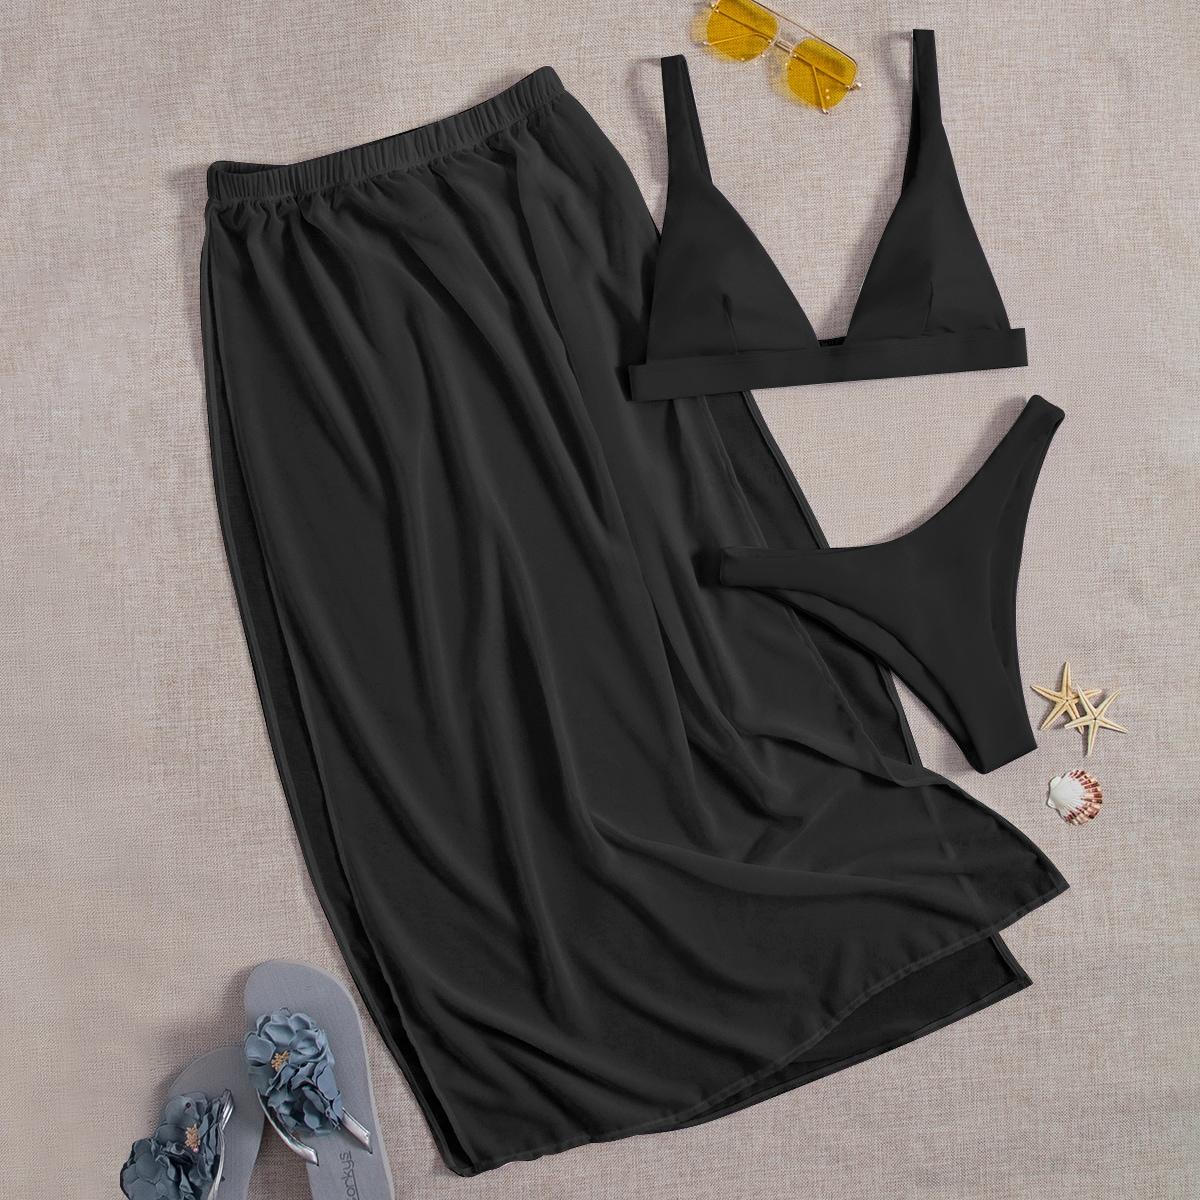 SHEIN / 3pack Plain Bikini Swimsuit & Mesh Beach Skirt